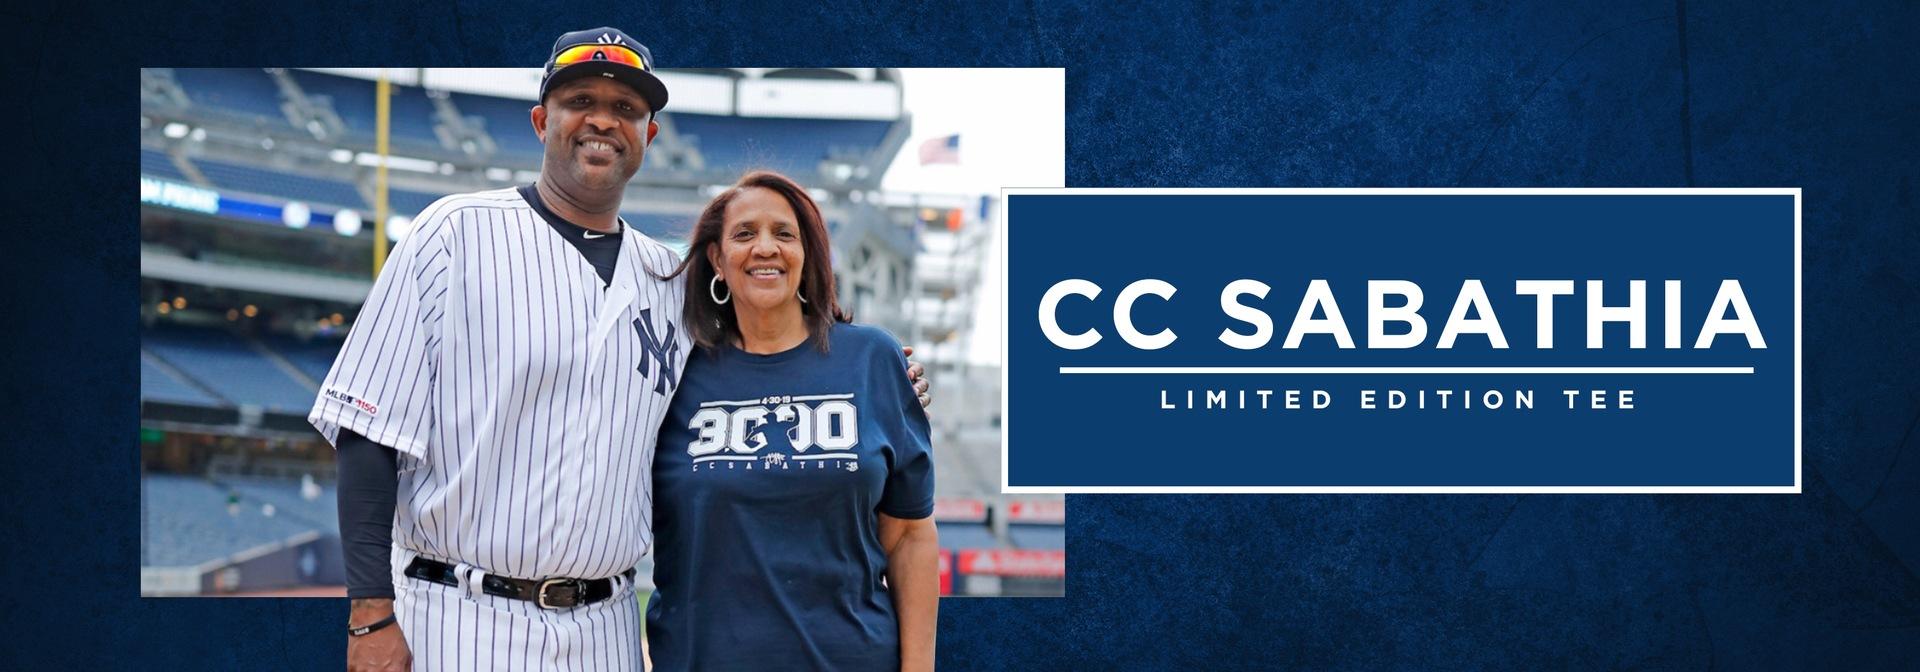 CC Sabathia | Limited Edition Apparel  Store